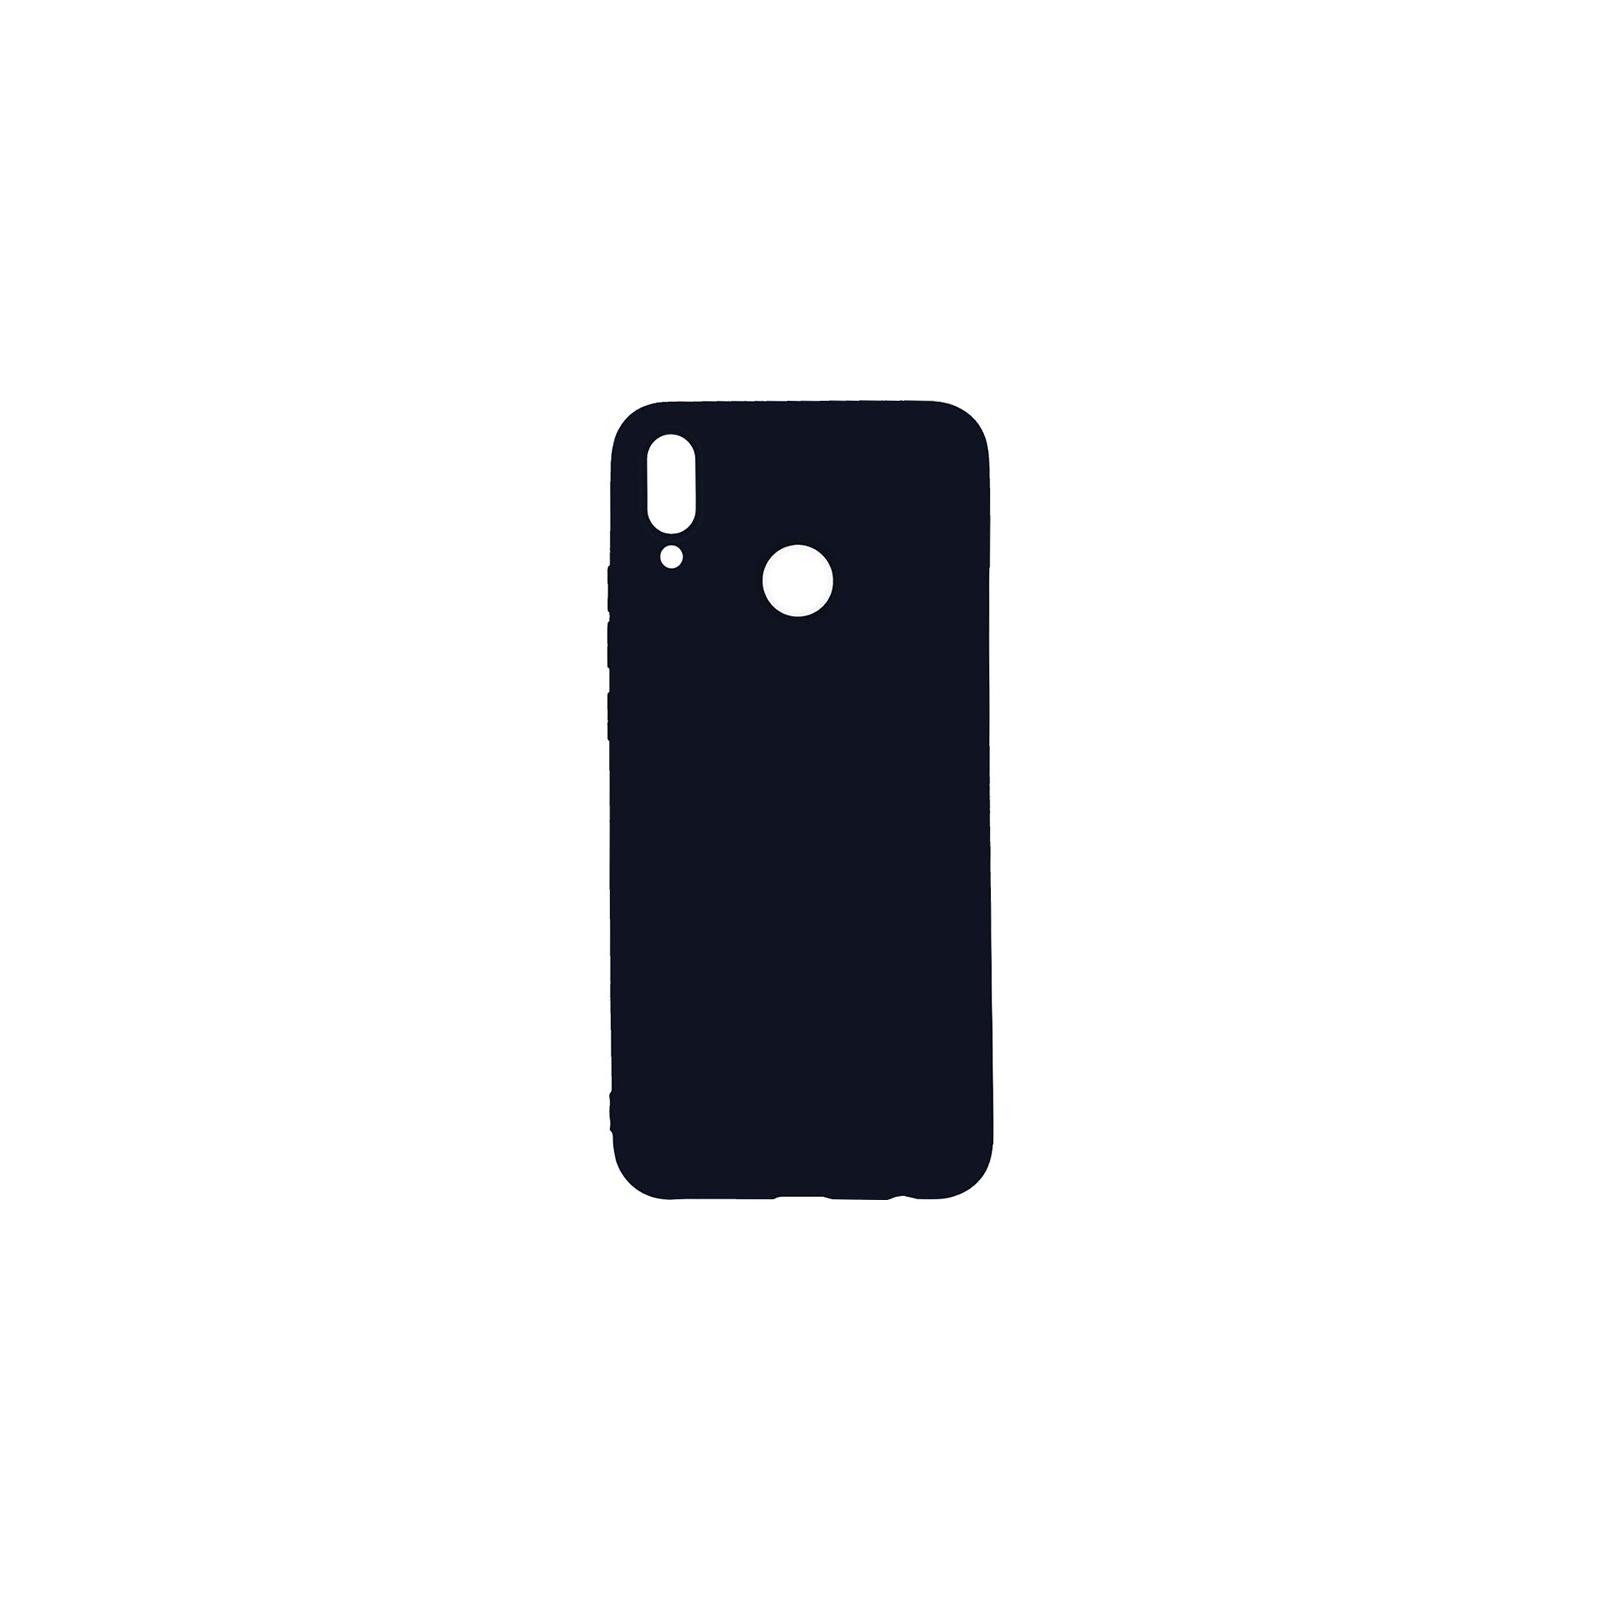 Чехол для моб. телефона Toto 1mm Matt TPU Case Huawei Y9 2019 Black (F_93948)